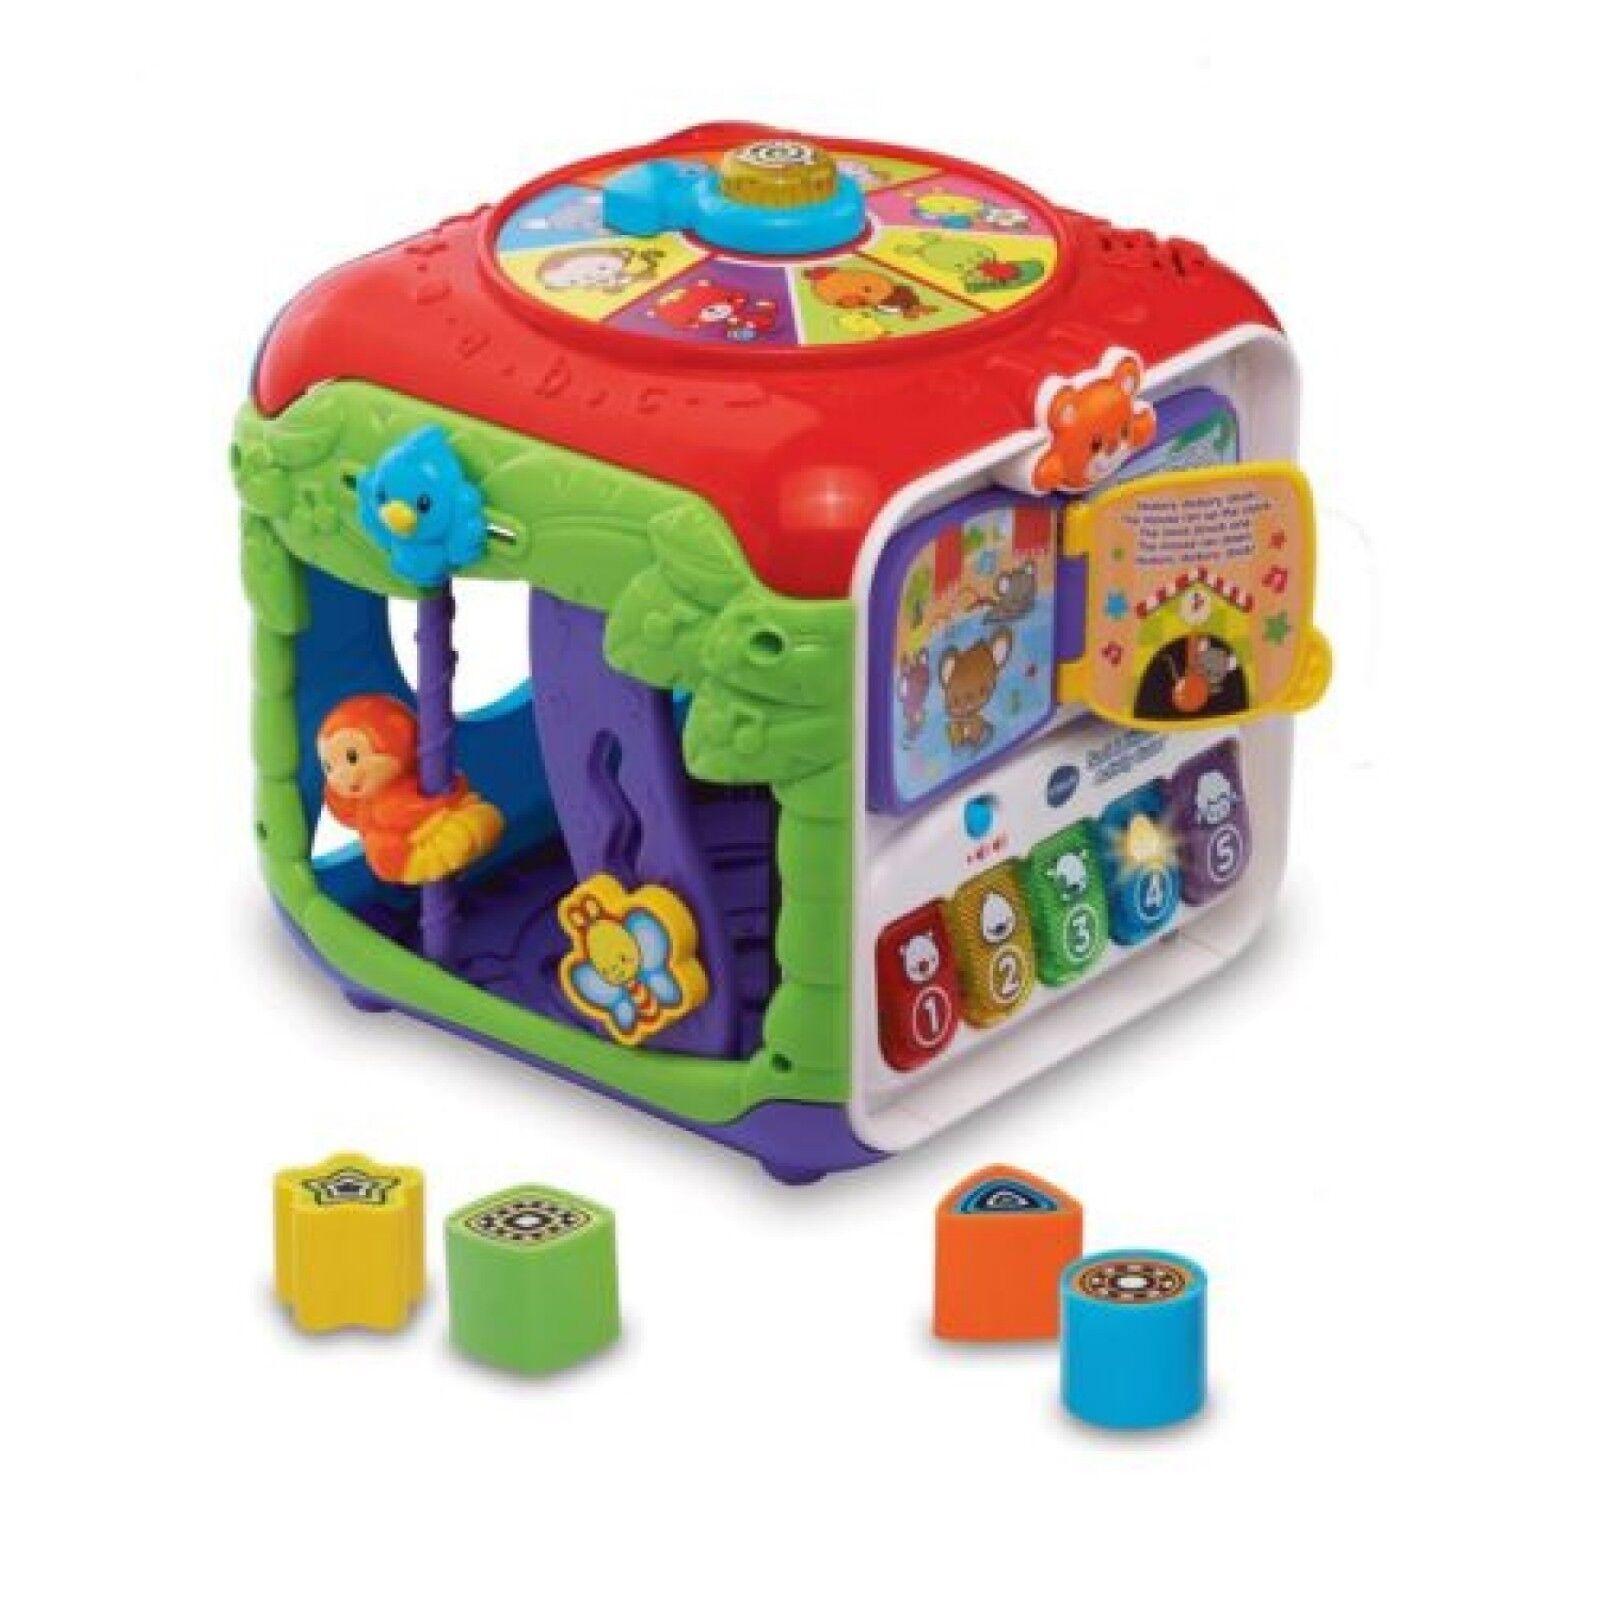 VTech Sort & Discover Activity Cube 80-183403 (9-36 months)